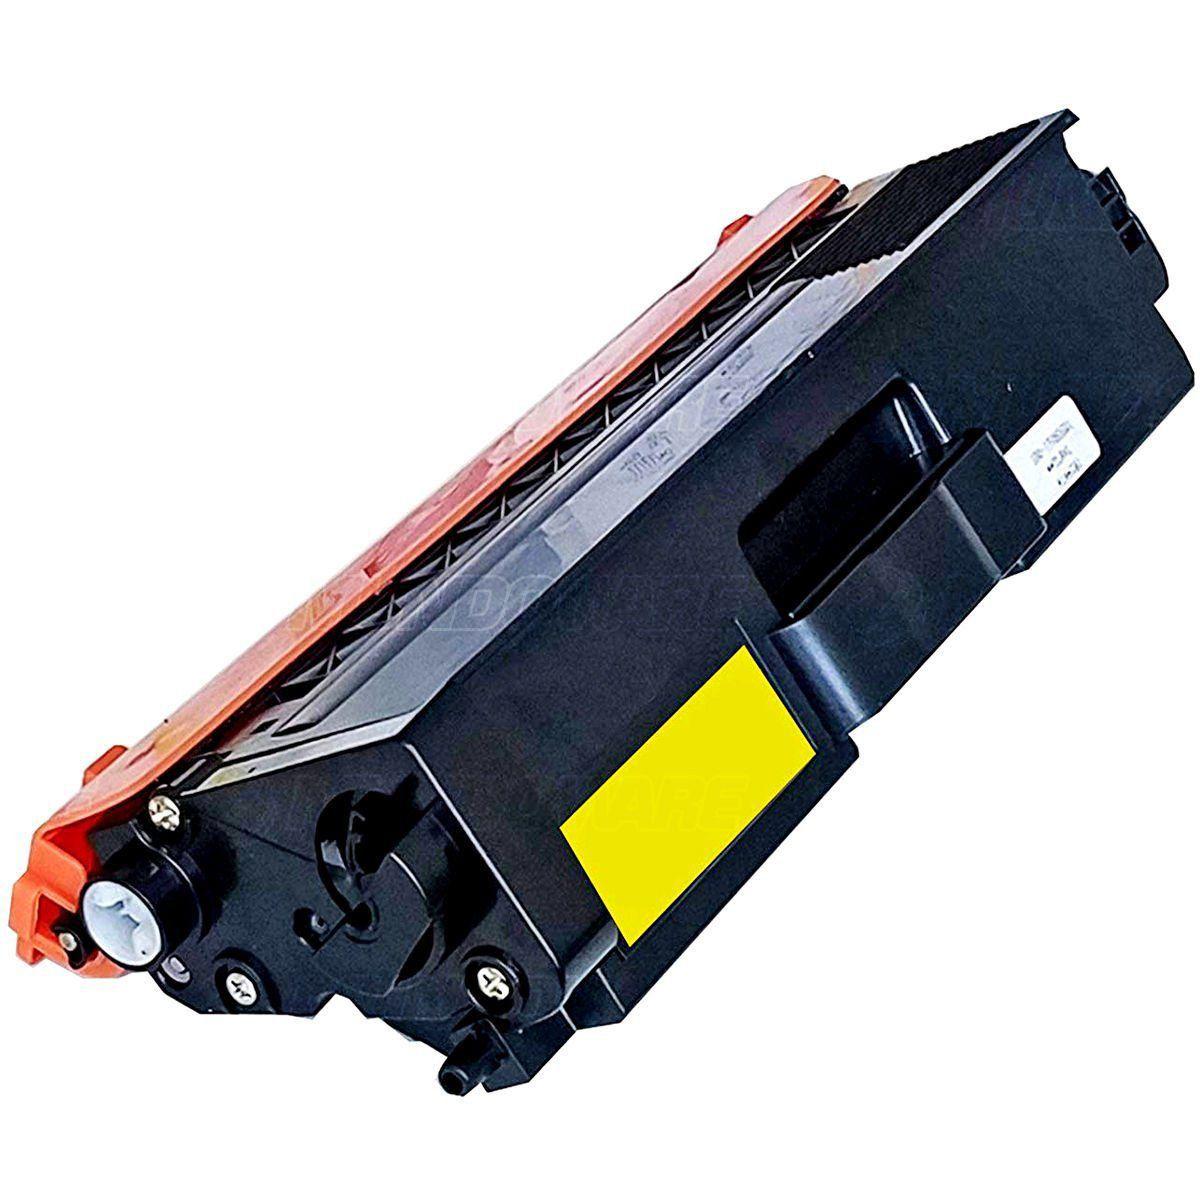 Compatível: Toner TN-419Y TN419 para Brother HL-L8360cdw MFC-L8610cdw MFC-L8900cdw MFC-L9570cdw / Amarelo / 9.000